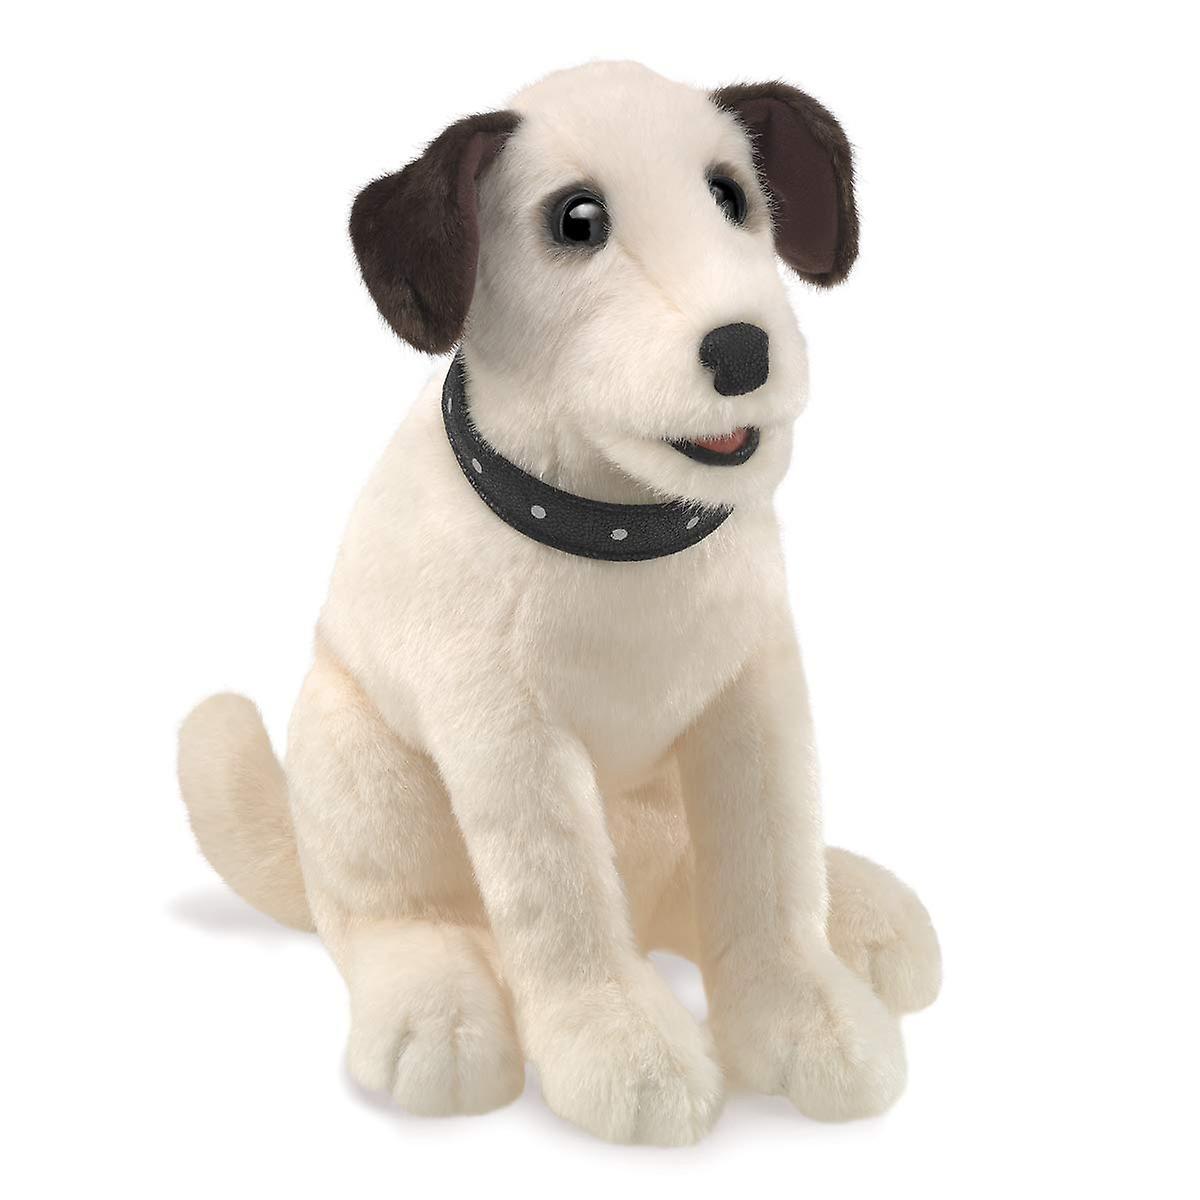 Hand Puppet - Folkhommeis - Terrier Sitting nouveau Toys Soft Doll Plush 3132